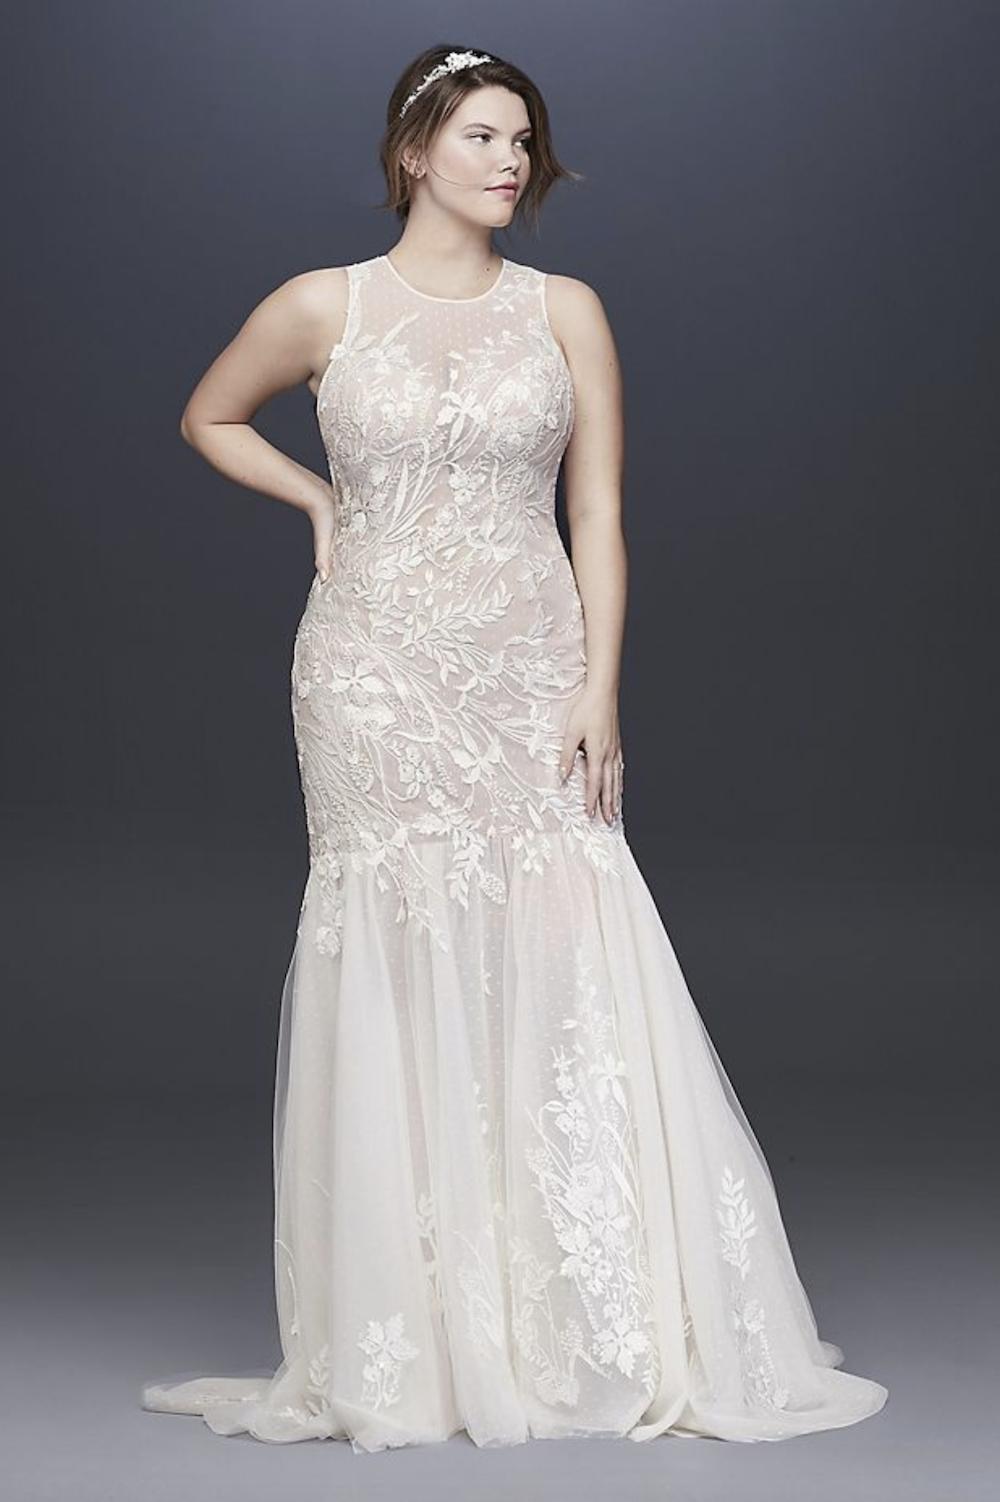 50 Plus Size Wedding Dresses For Curvy Brides Curvy Girl Dresses Davids Bridal Wedding Dresses Davids Bridal Plus Size Sweet Wedding Dresses [ 1502 x 1000 Pixel ]